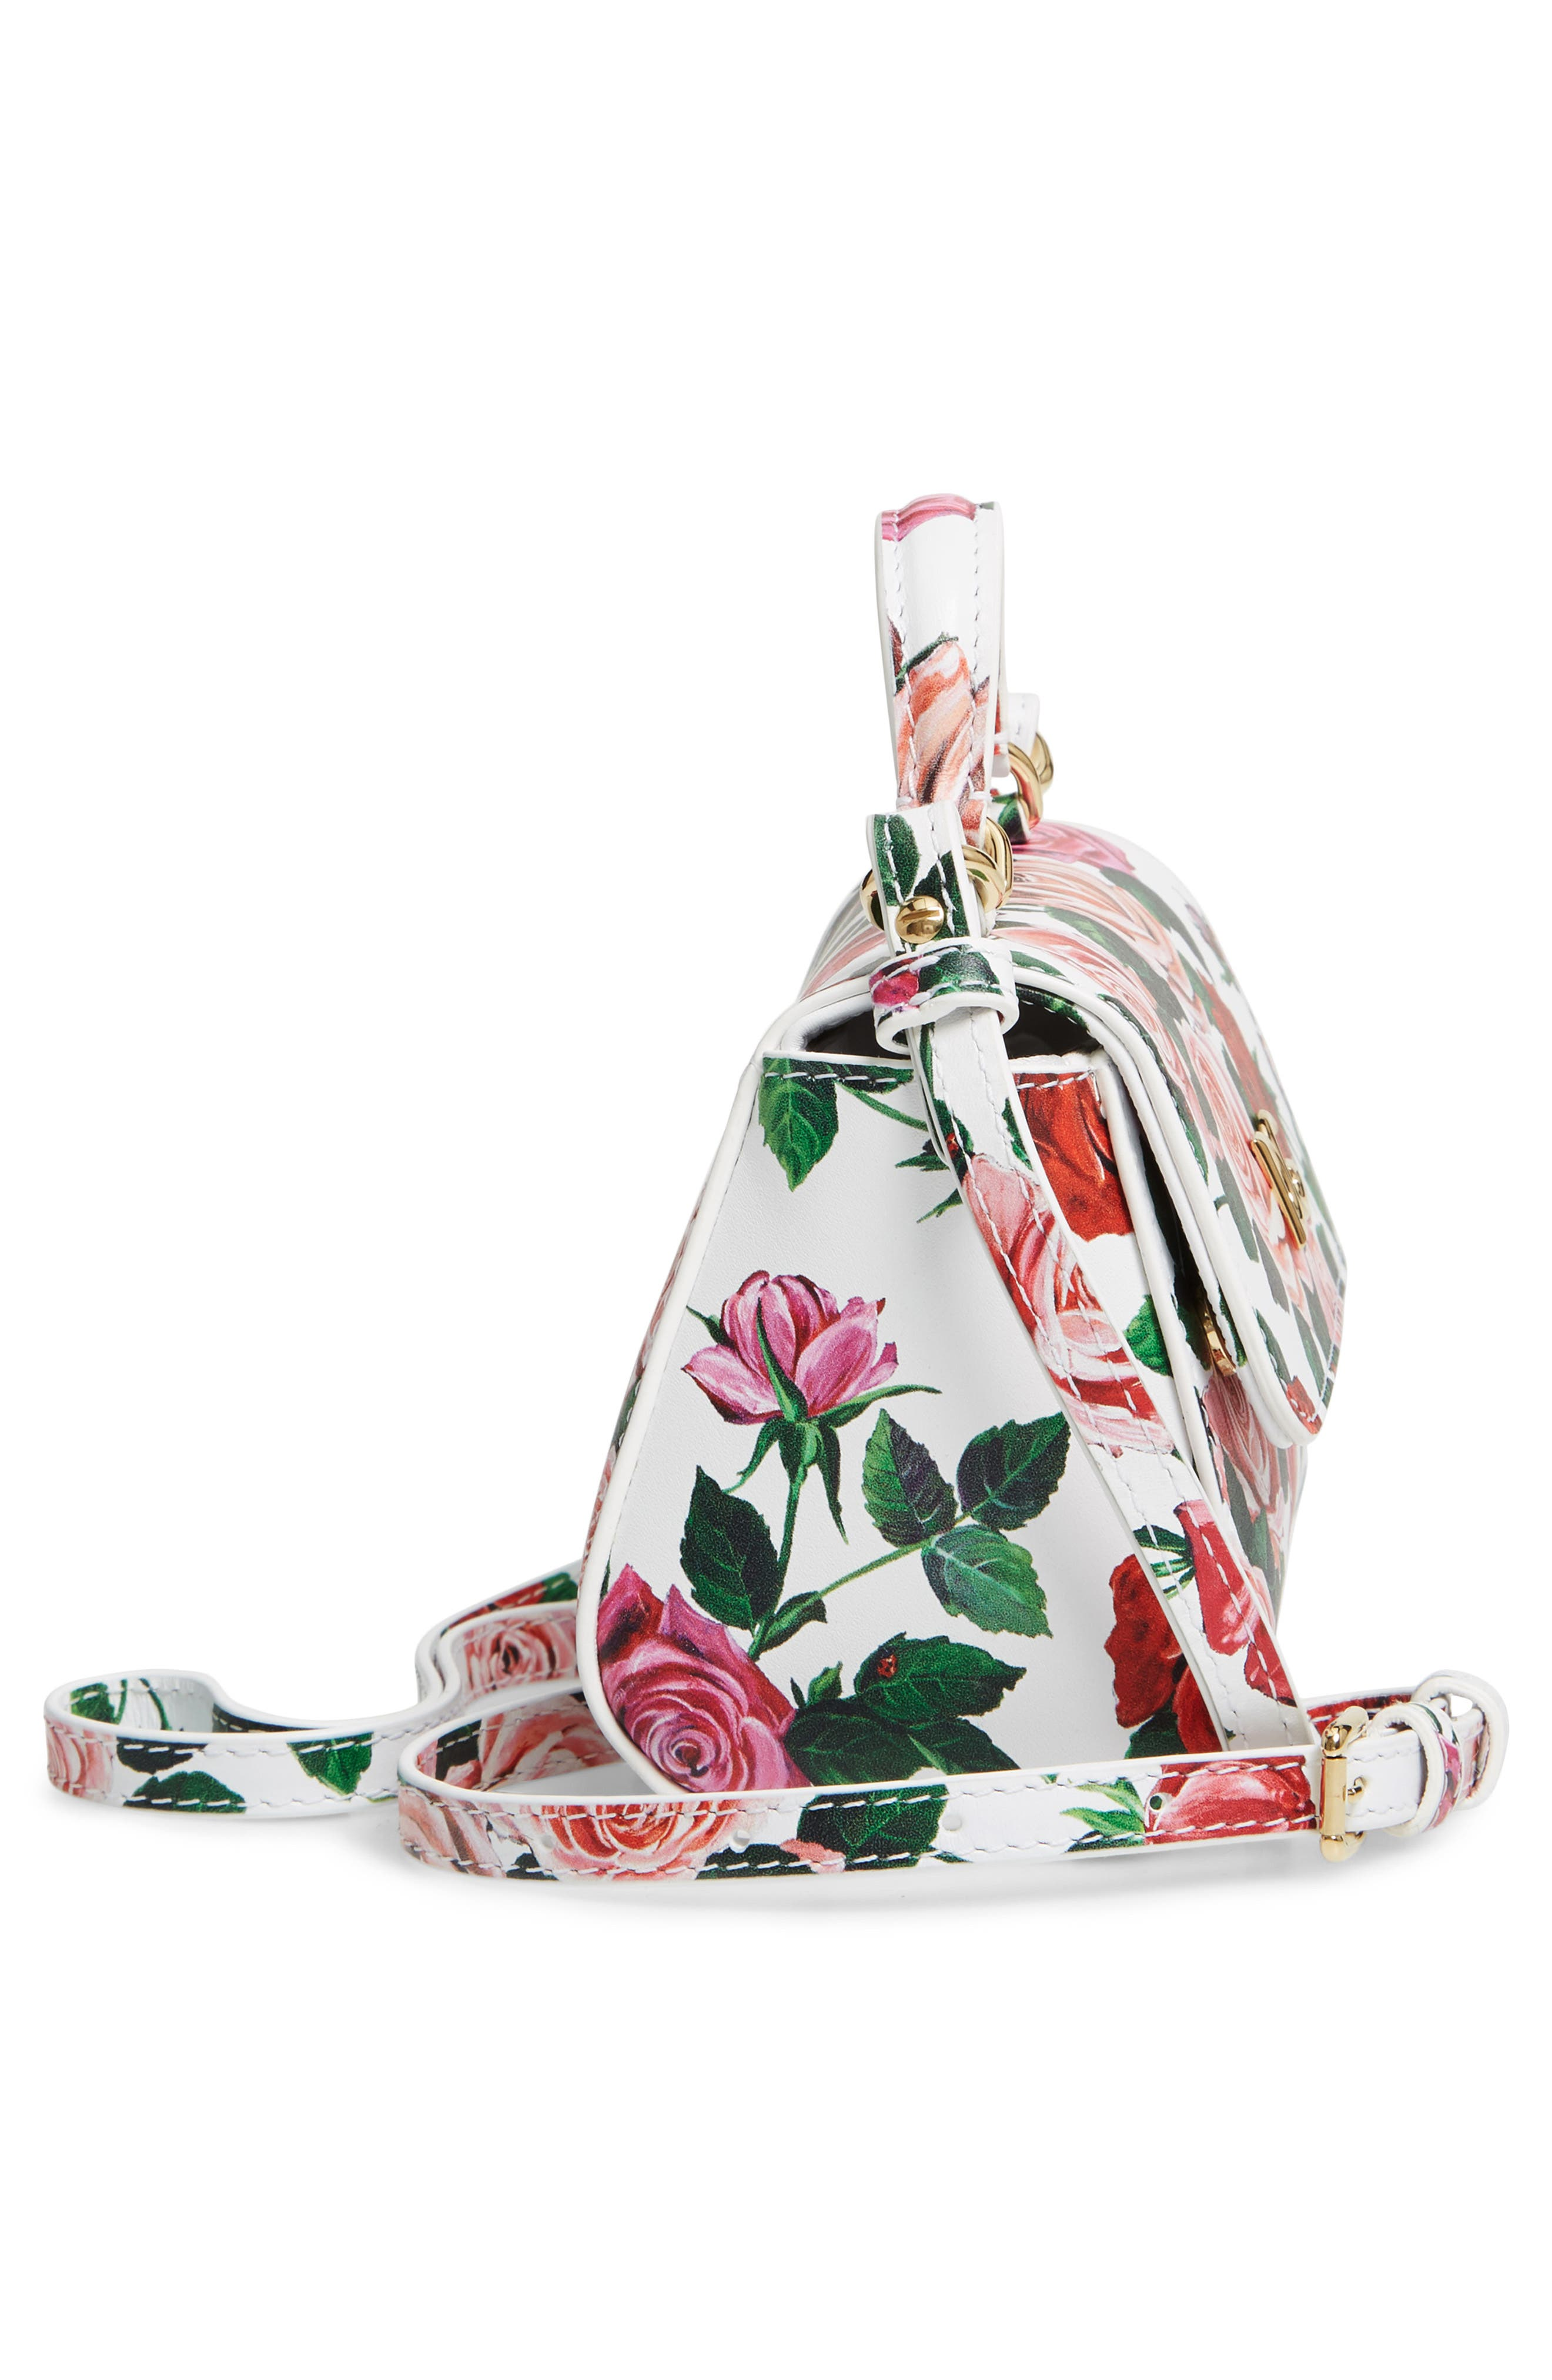 DOLCE&GABBANA, Floral Print Handbag, Alternate thumbnail 4, color, MIX ROSE FDO BCO NAT